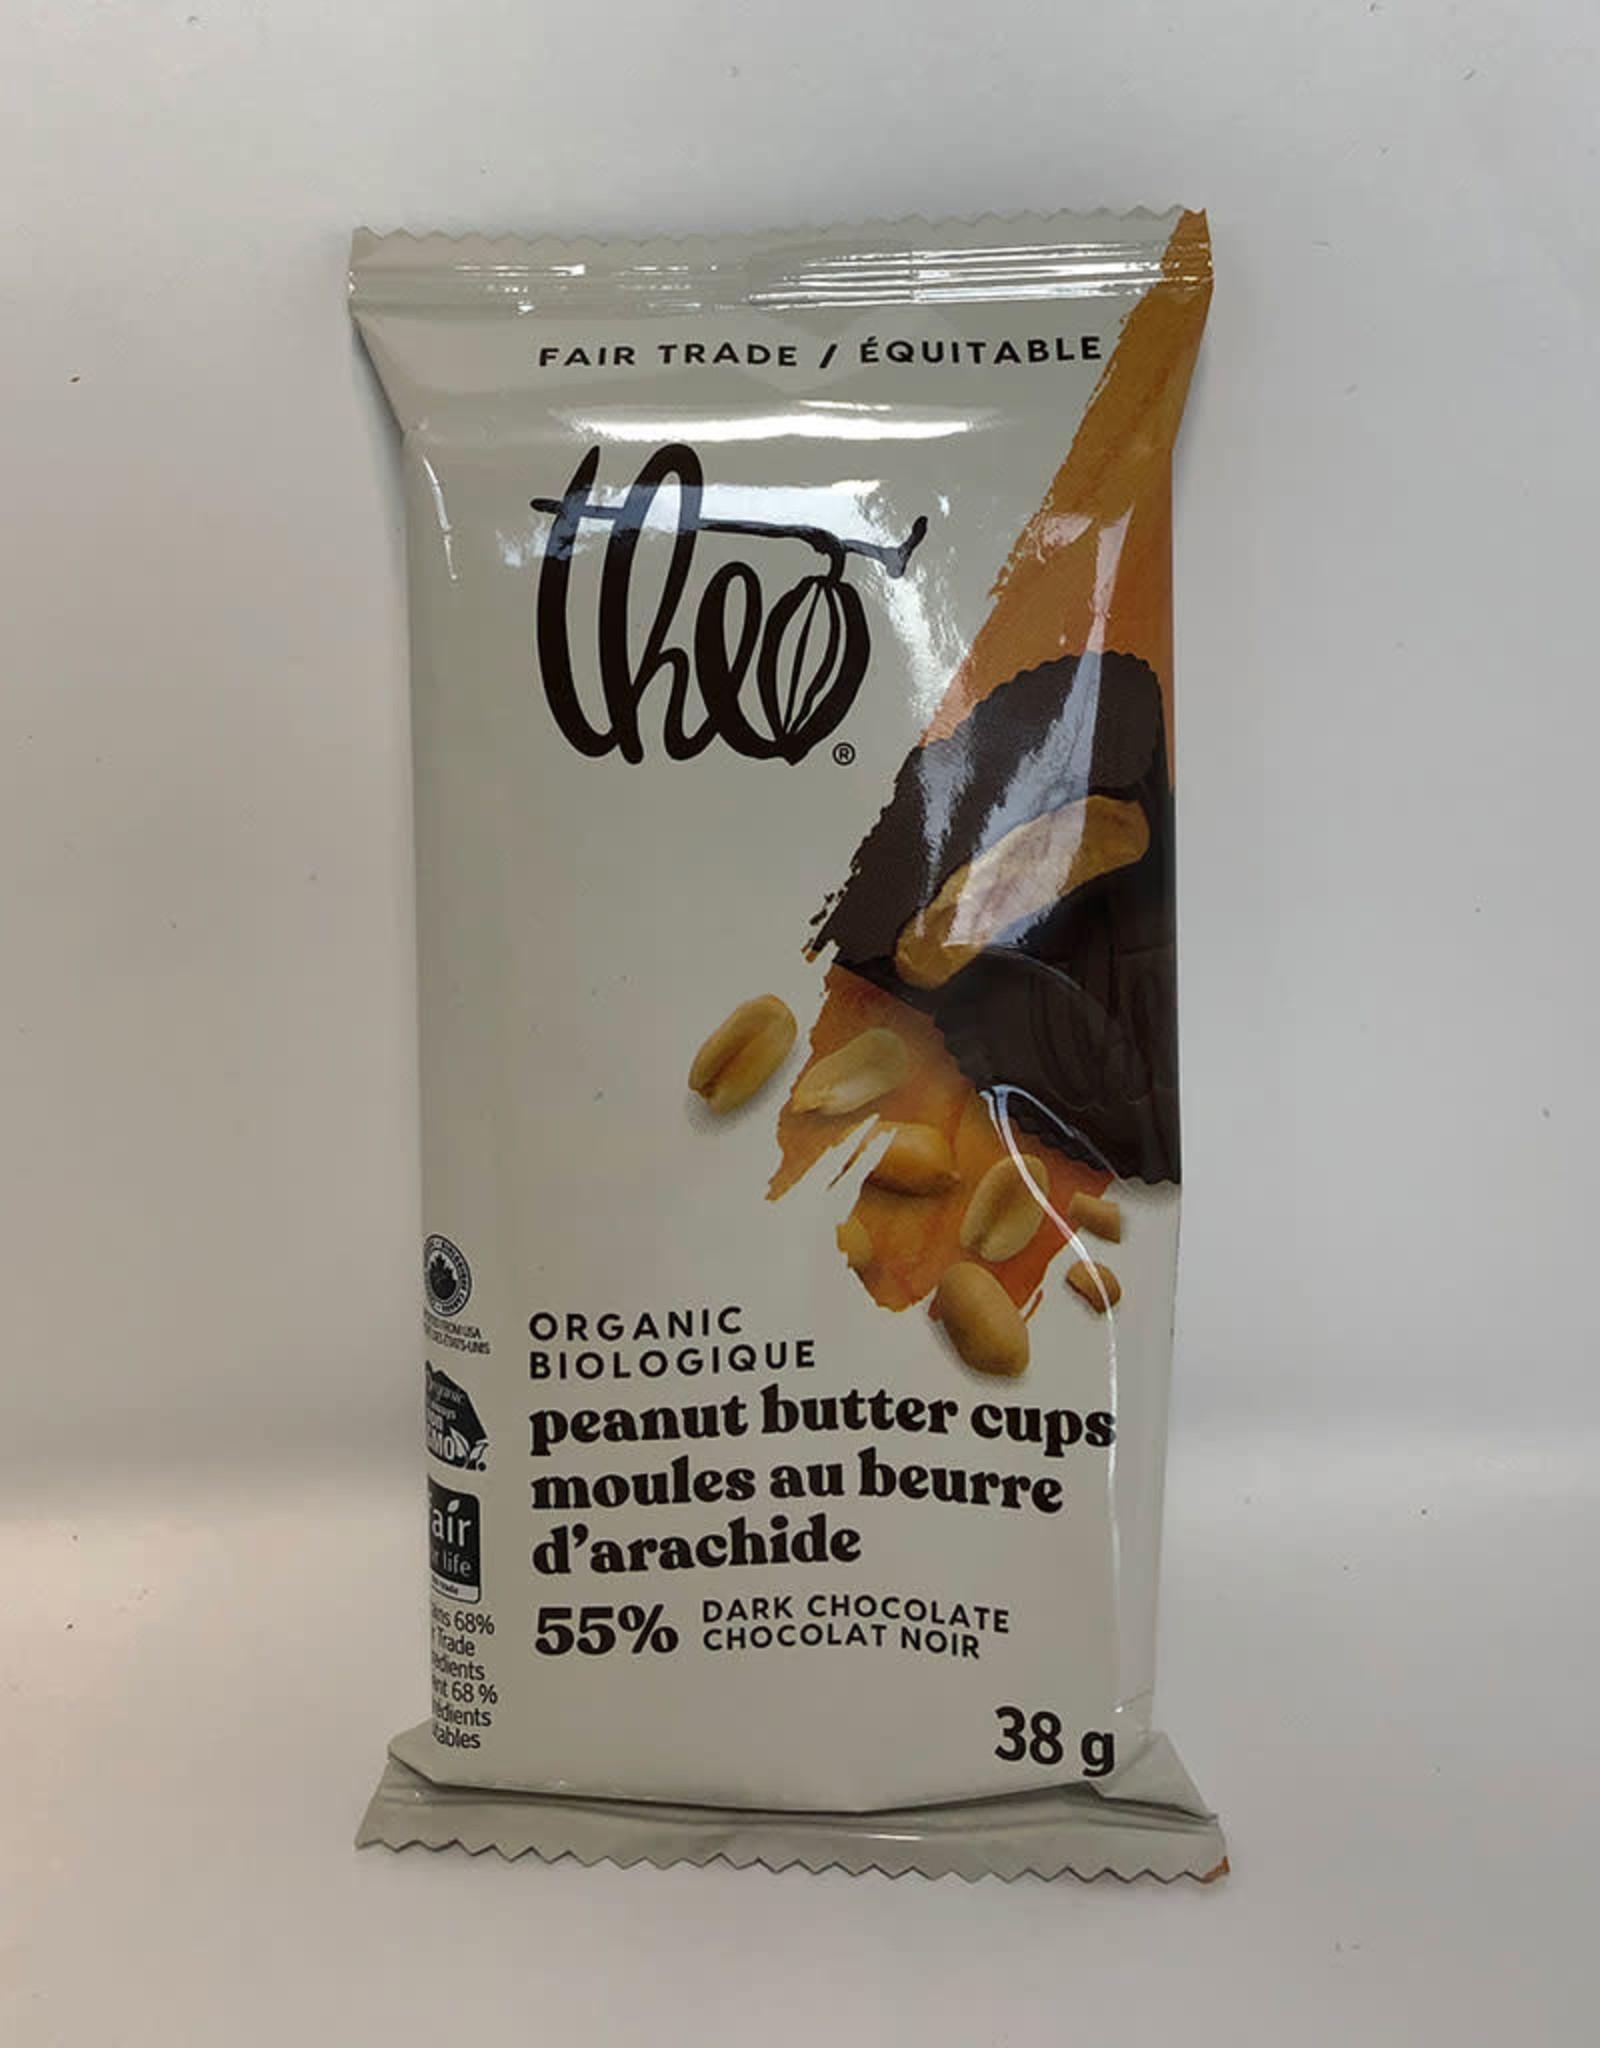 Theo Theo - Dark Chocolate, Peanut Butter Cups (38g)